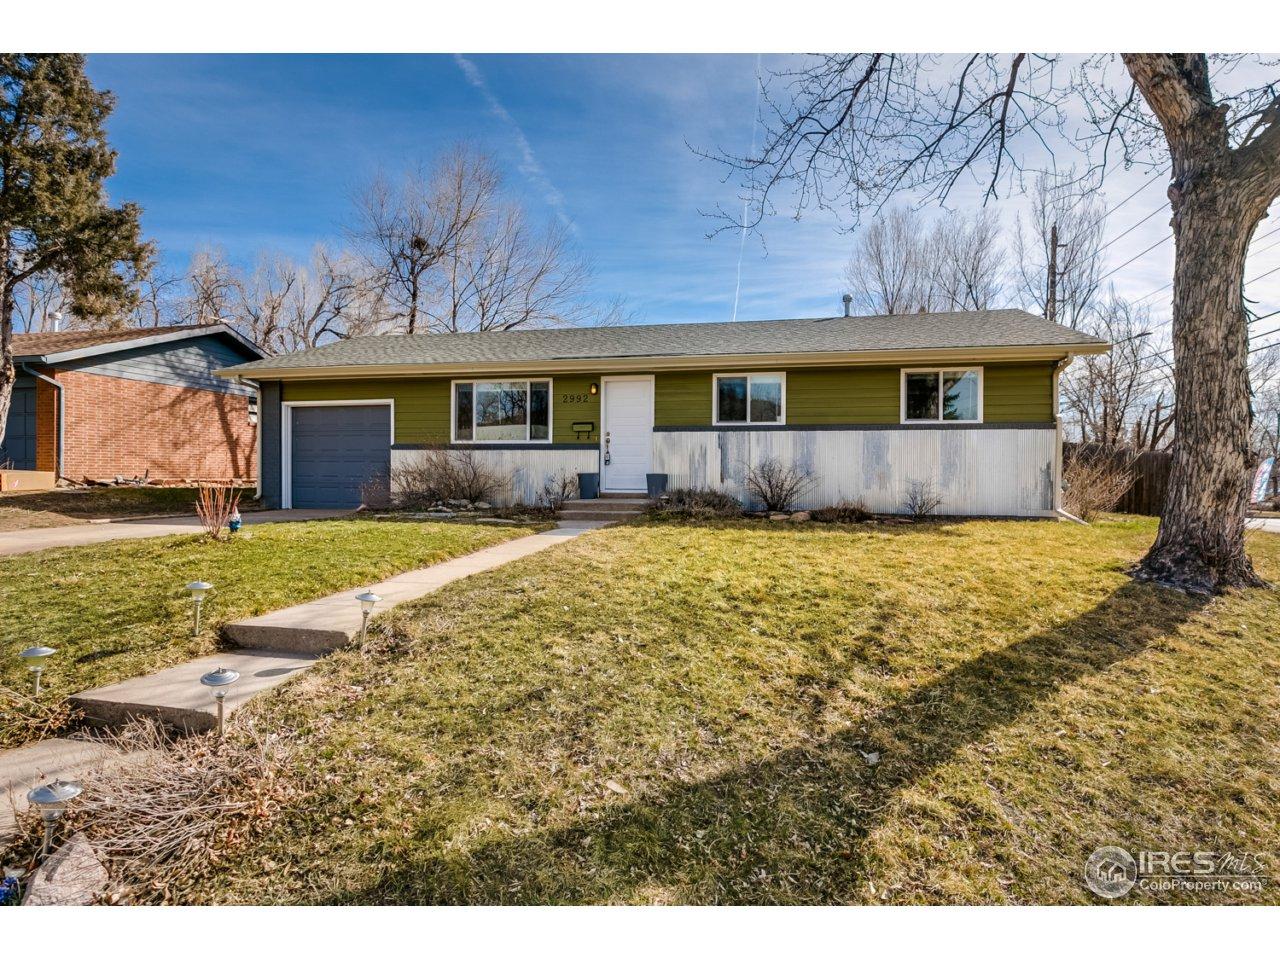 2992 24th St, Boulder CO 80304